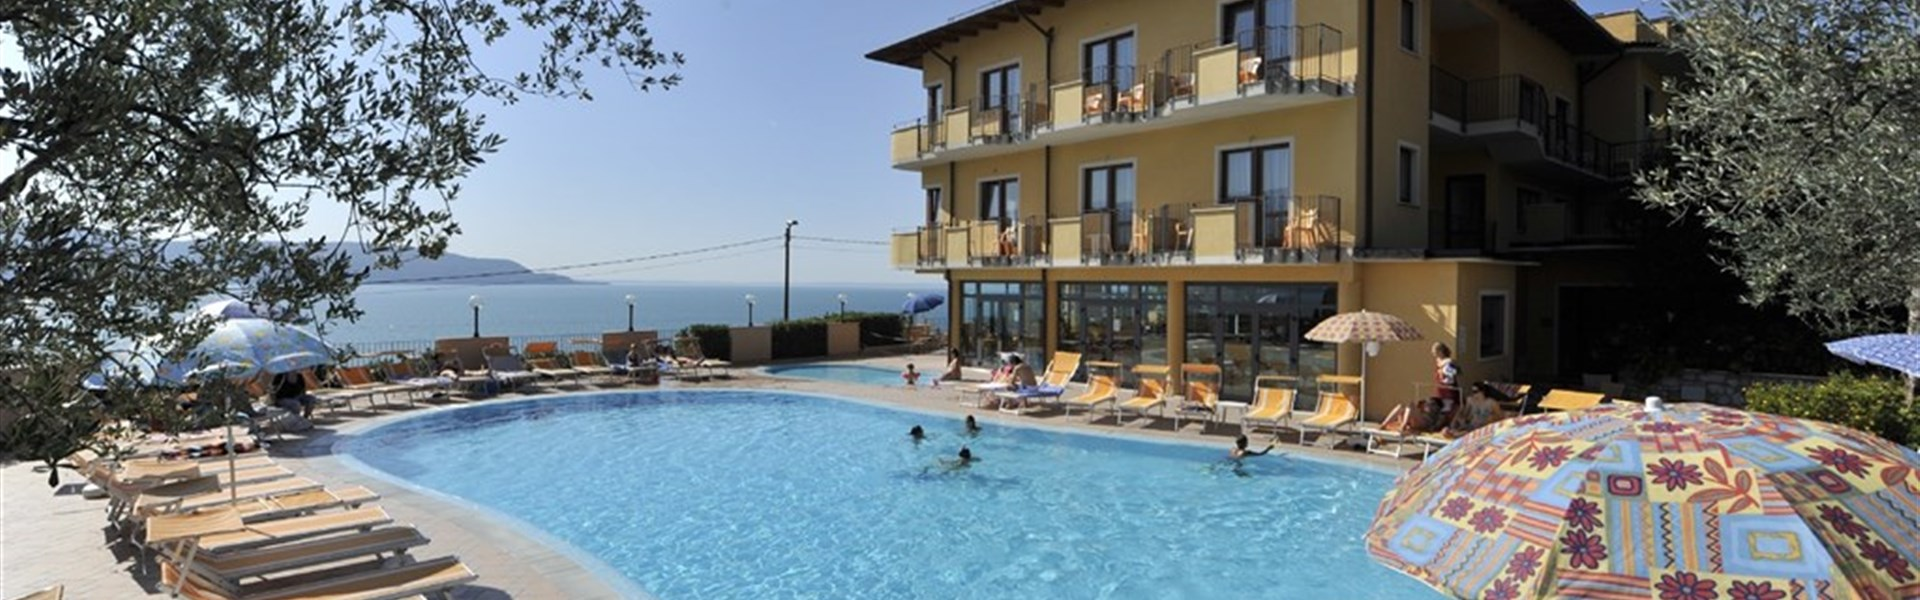 Hotel Piccolo Paradiso -